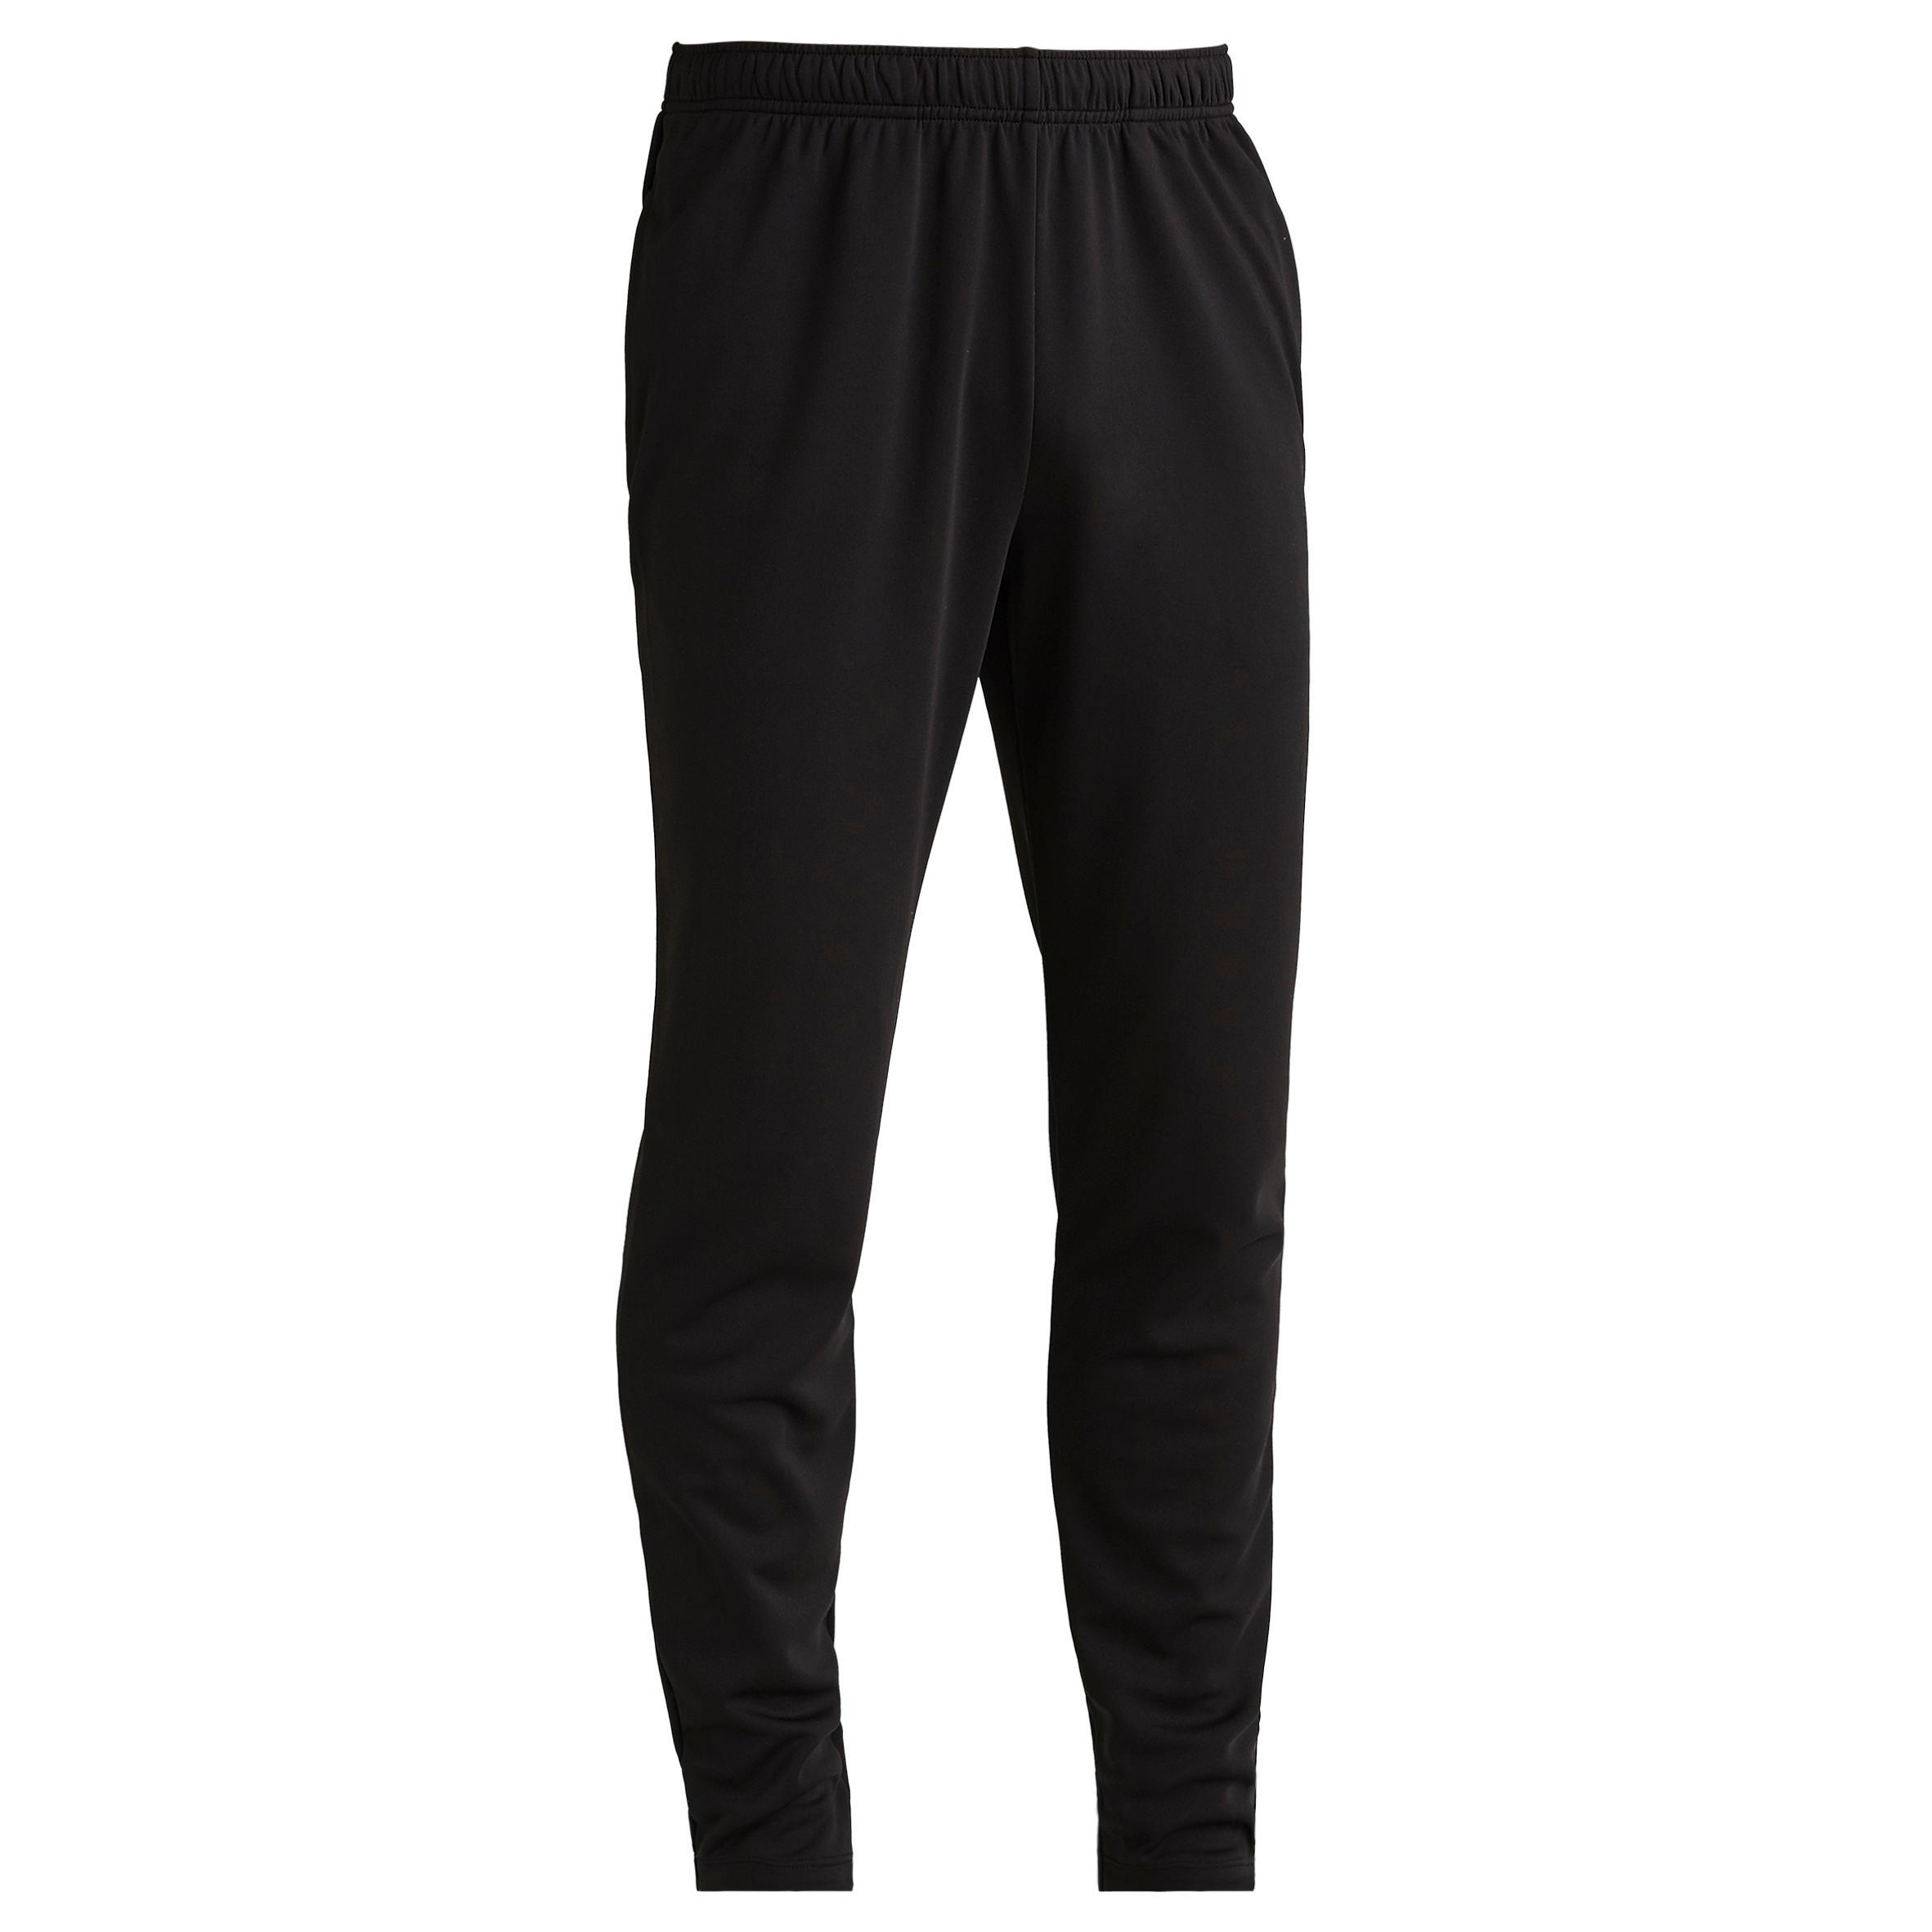 T100 Adult Soccer Training Bottoms - Black